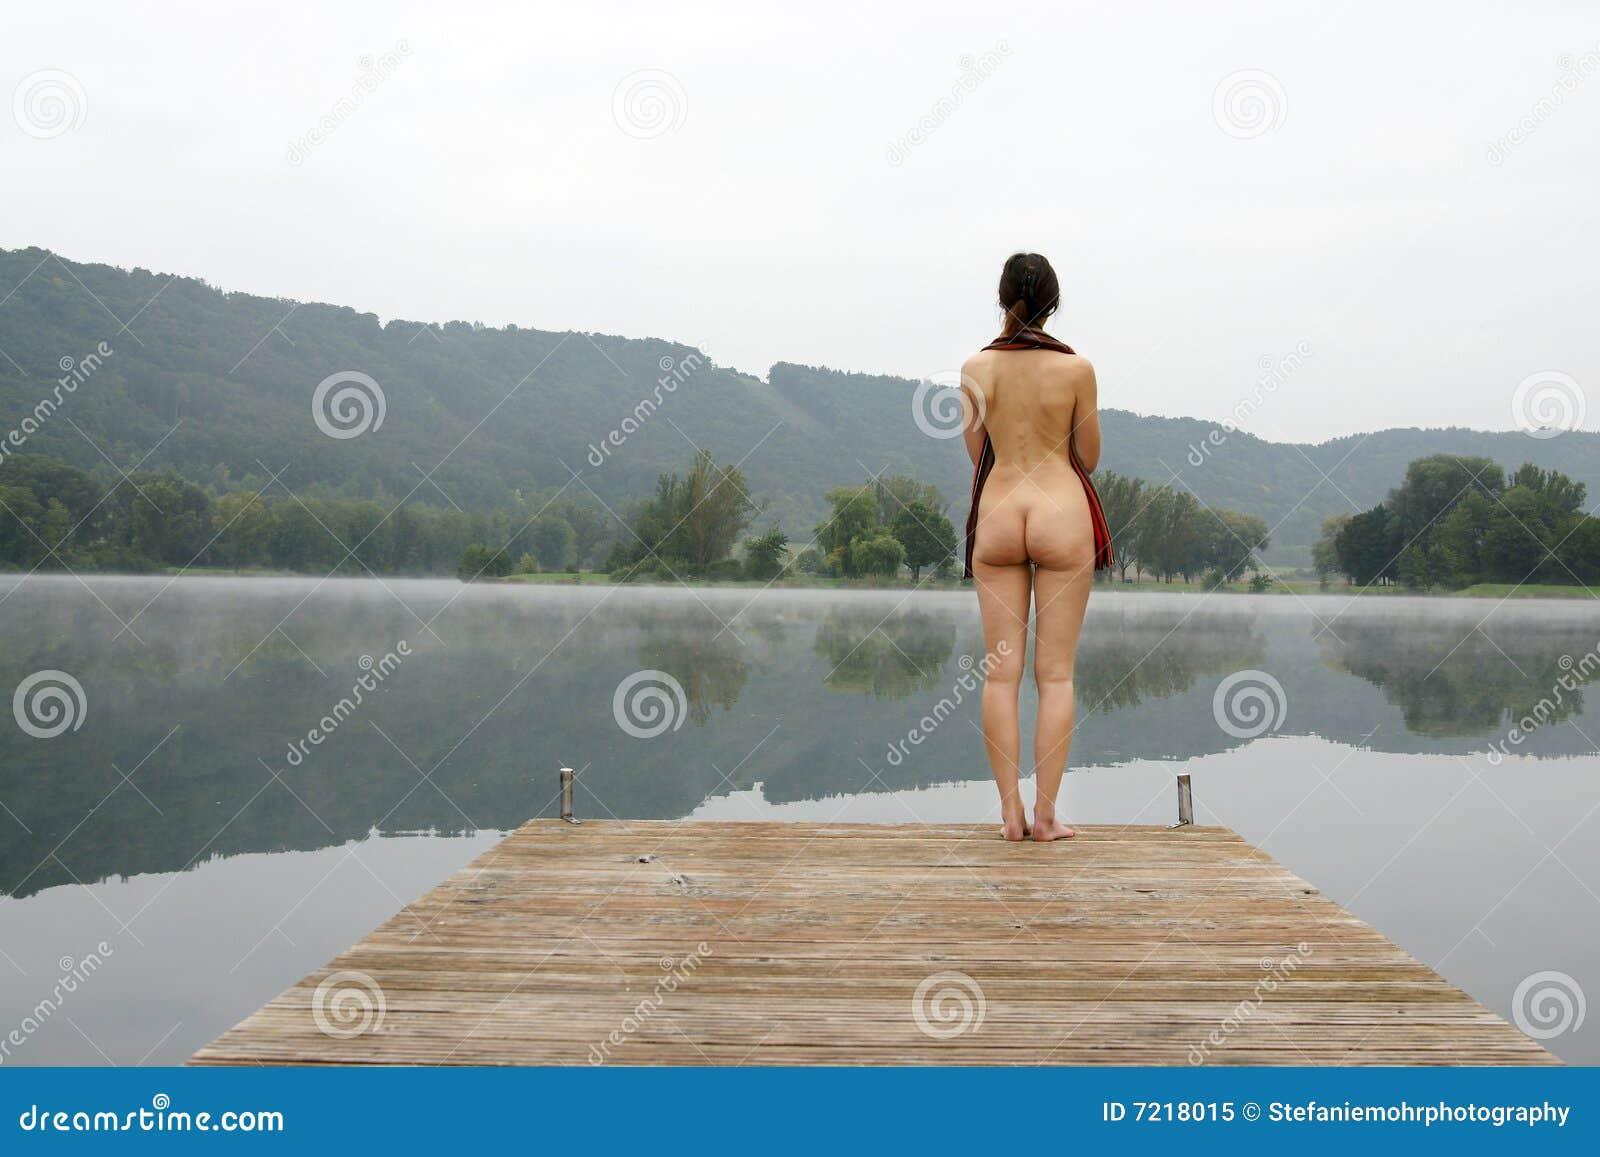 Video Of Nude Woman In Lake 45